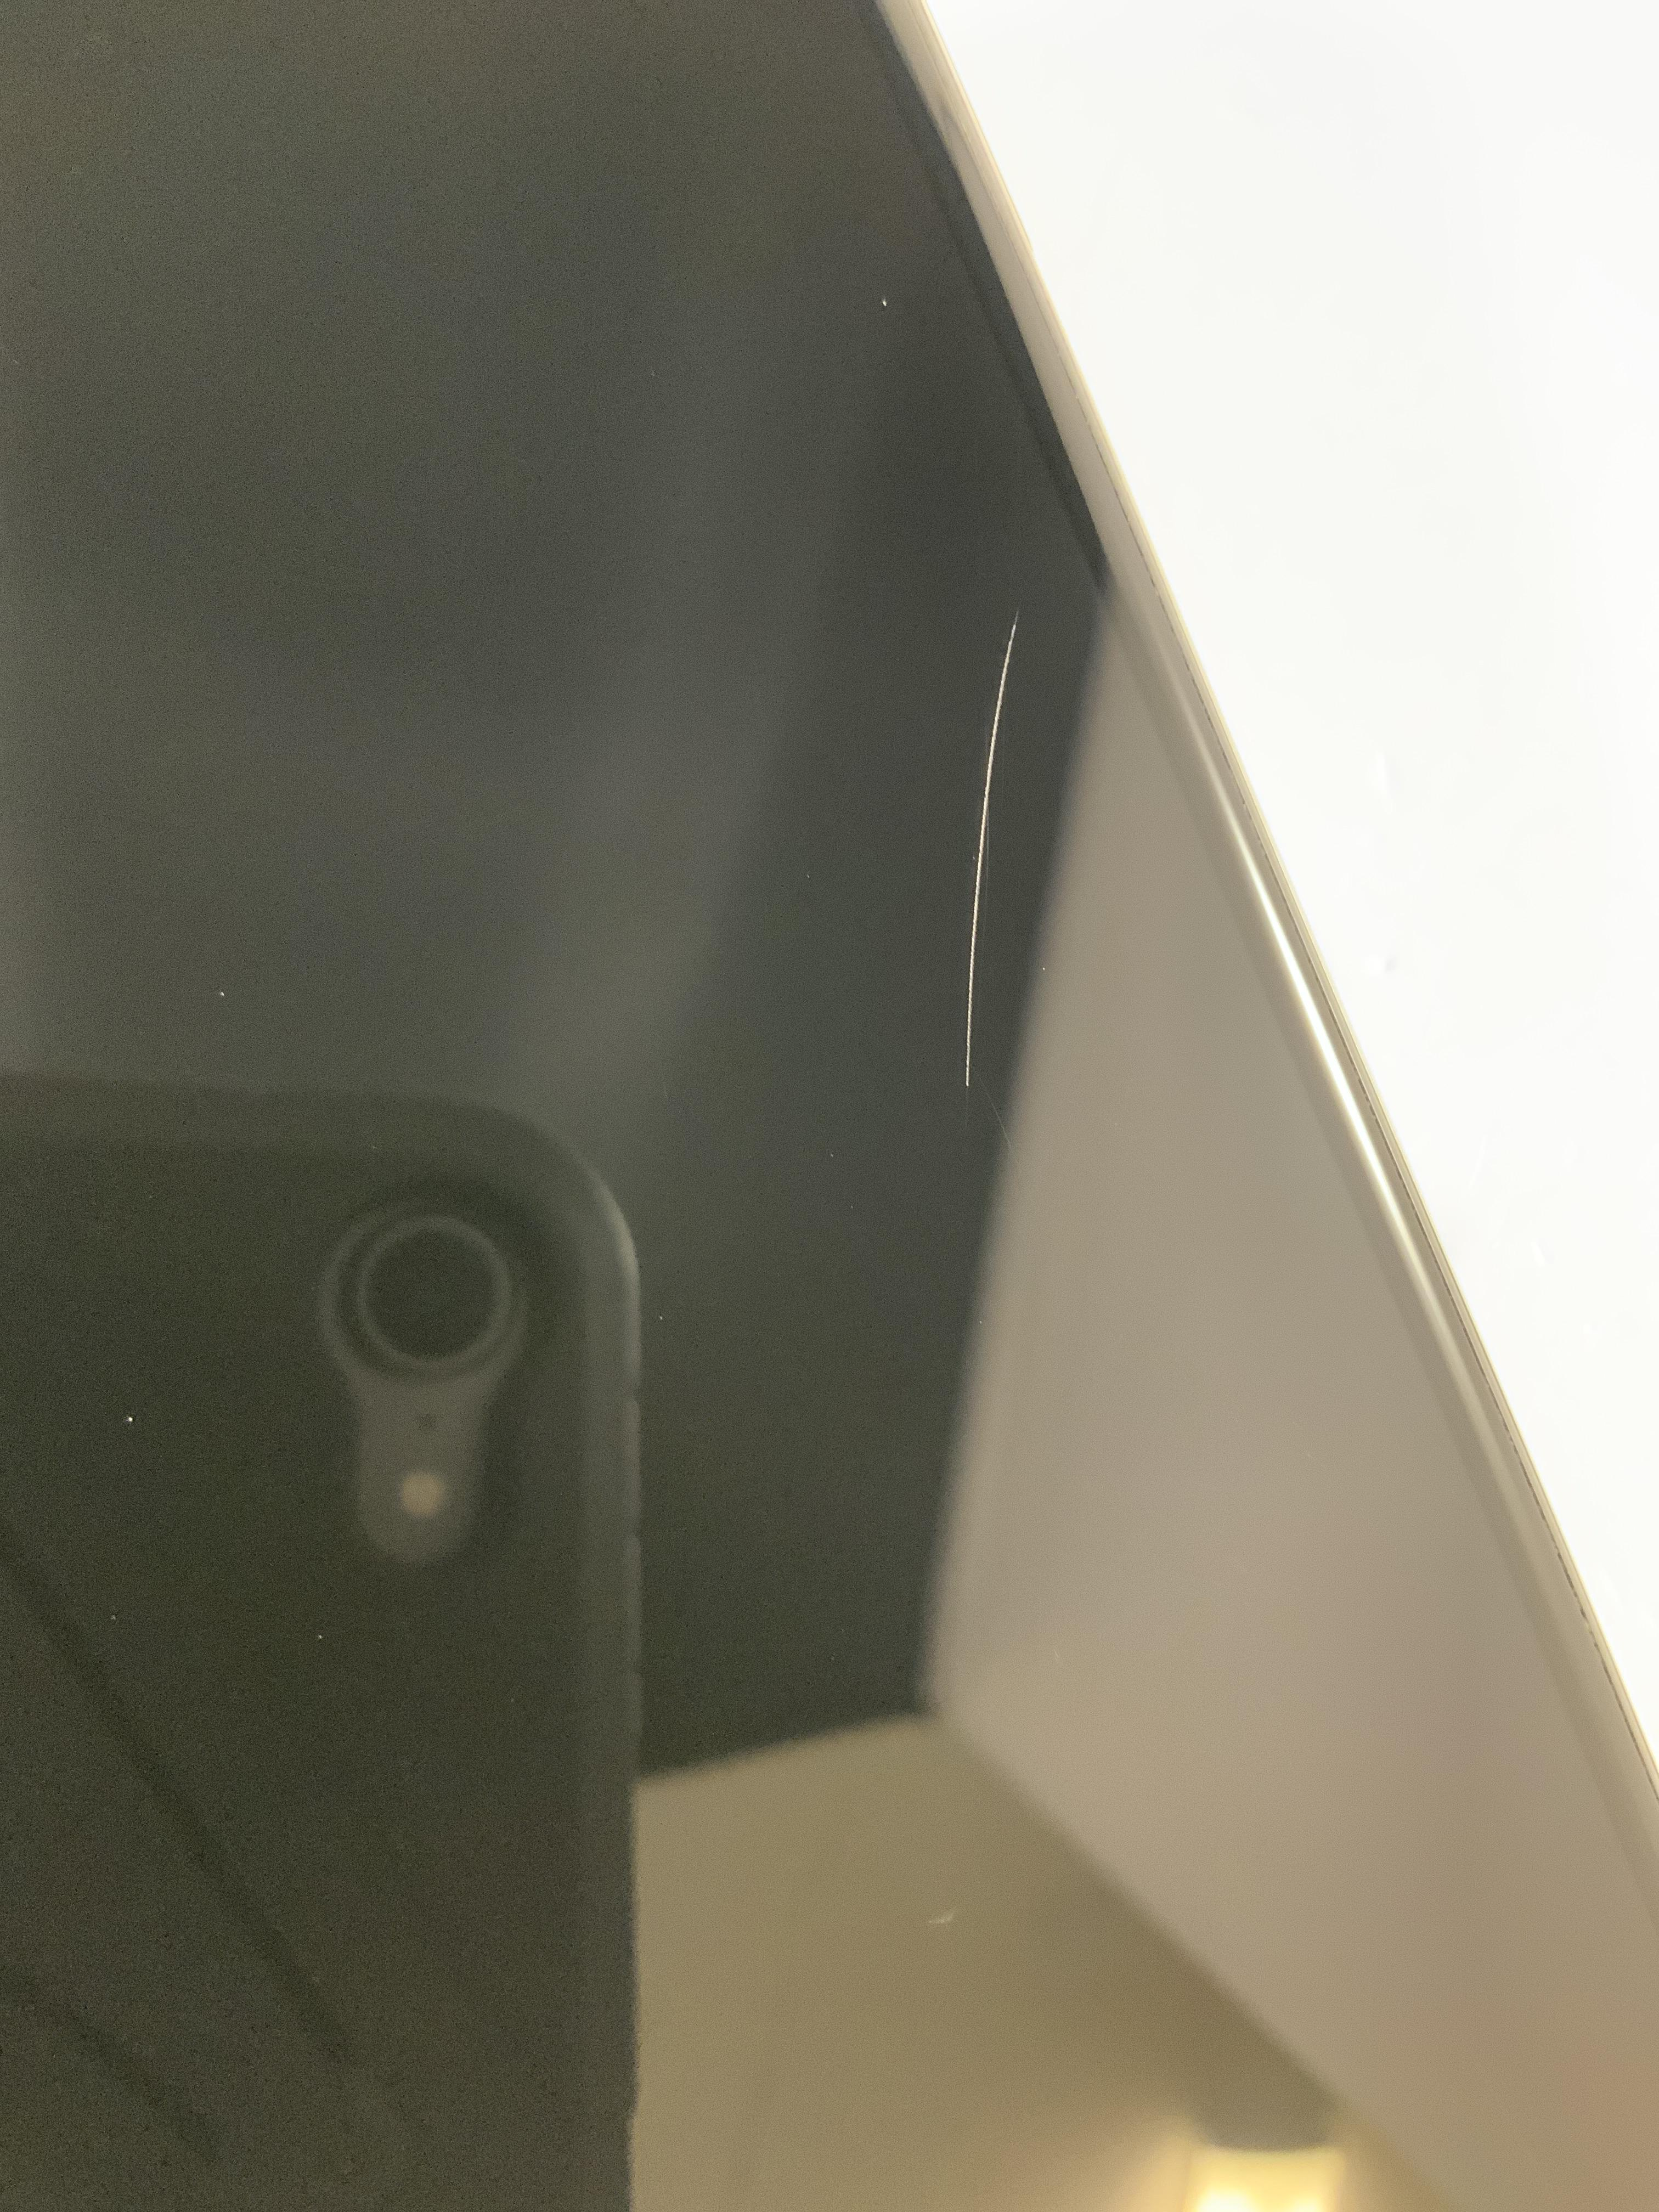 iPhone 11 Pro Max 256GB, 256GB, Space Gray, imagen 3